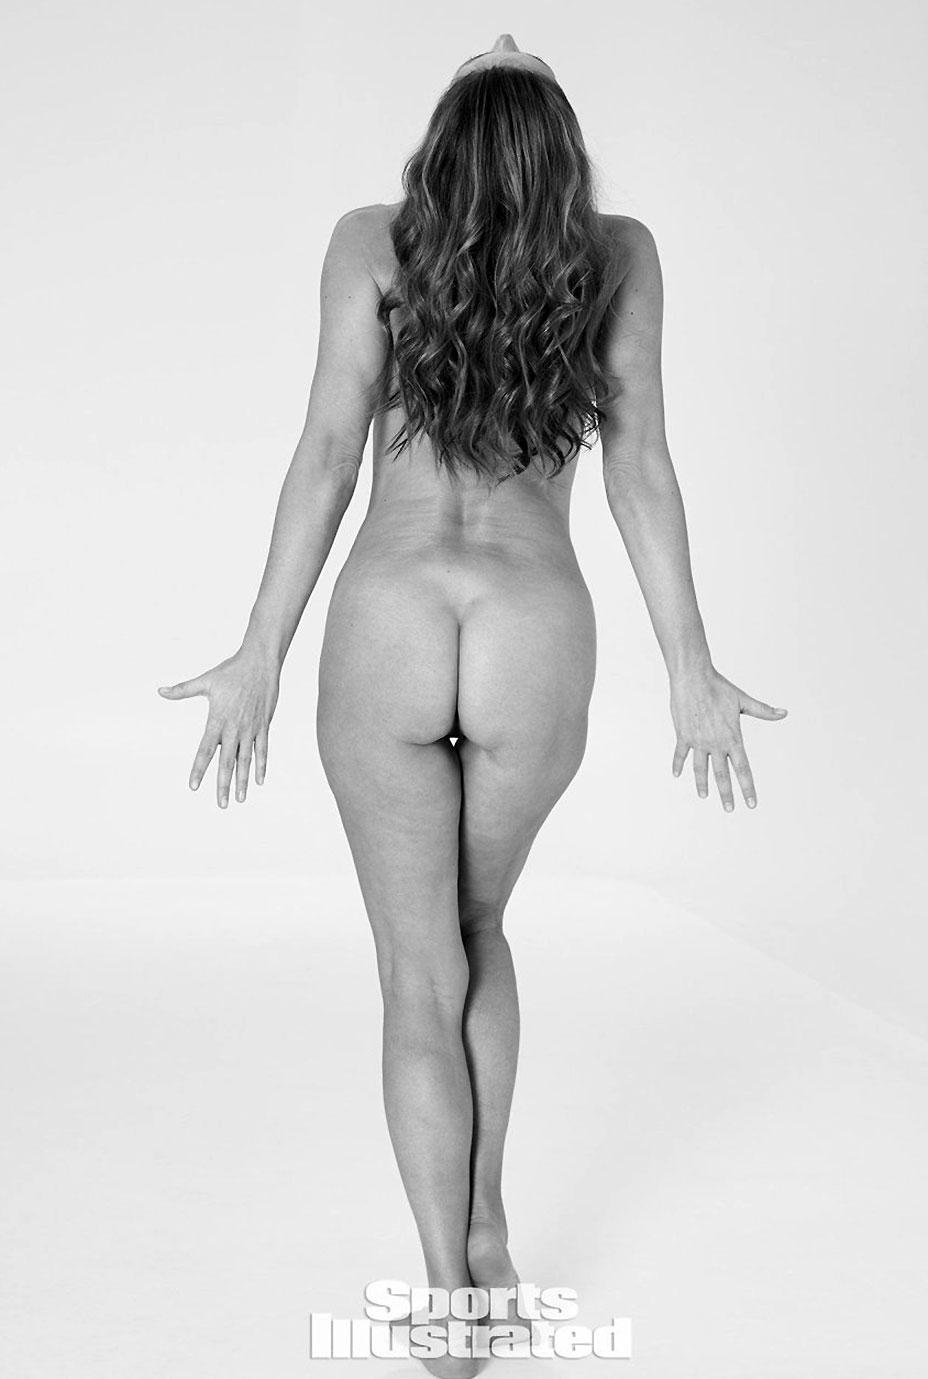 Paulina Porizkova nude ass